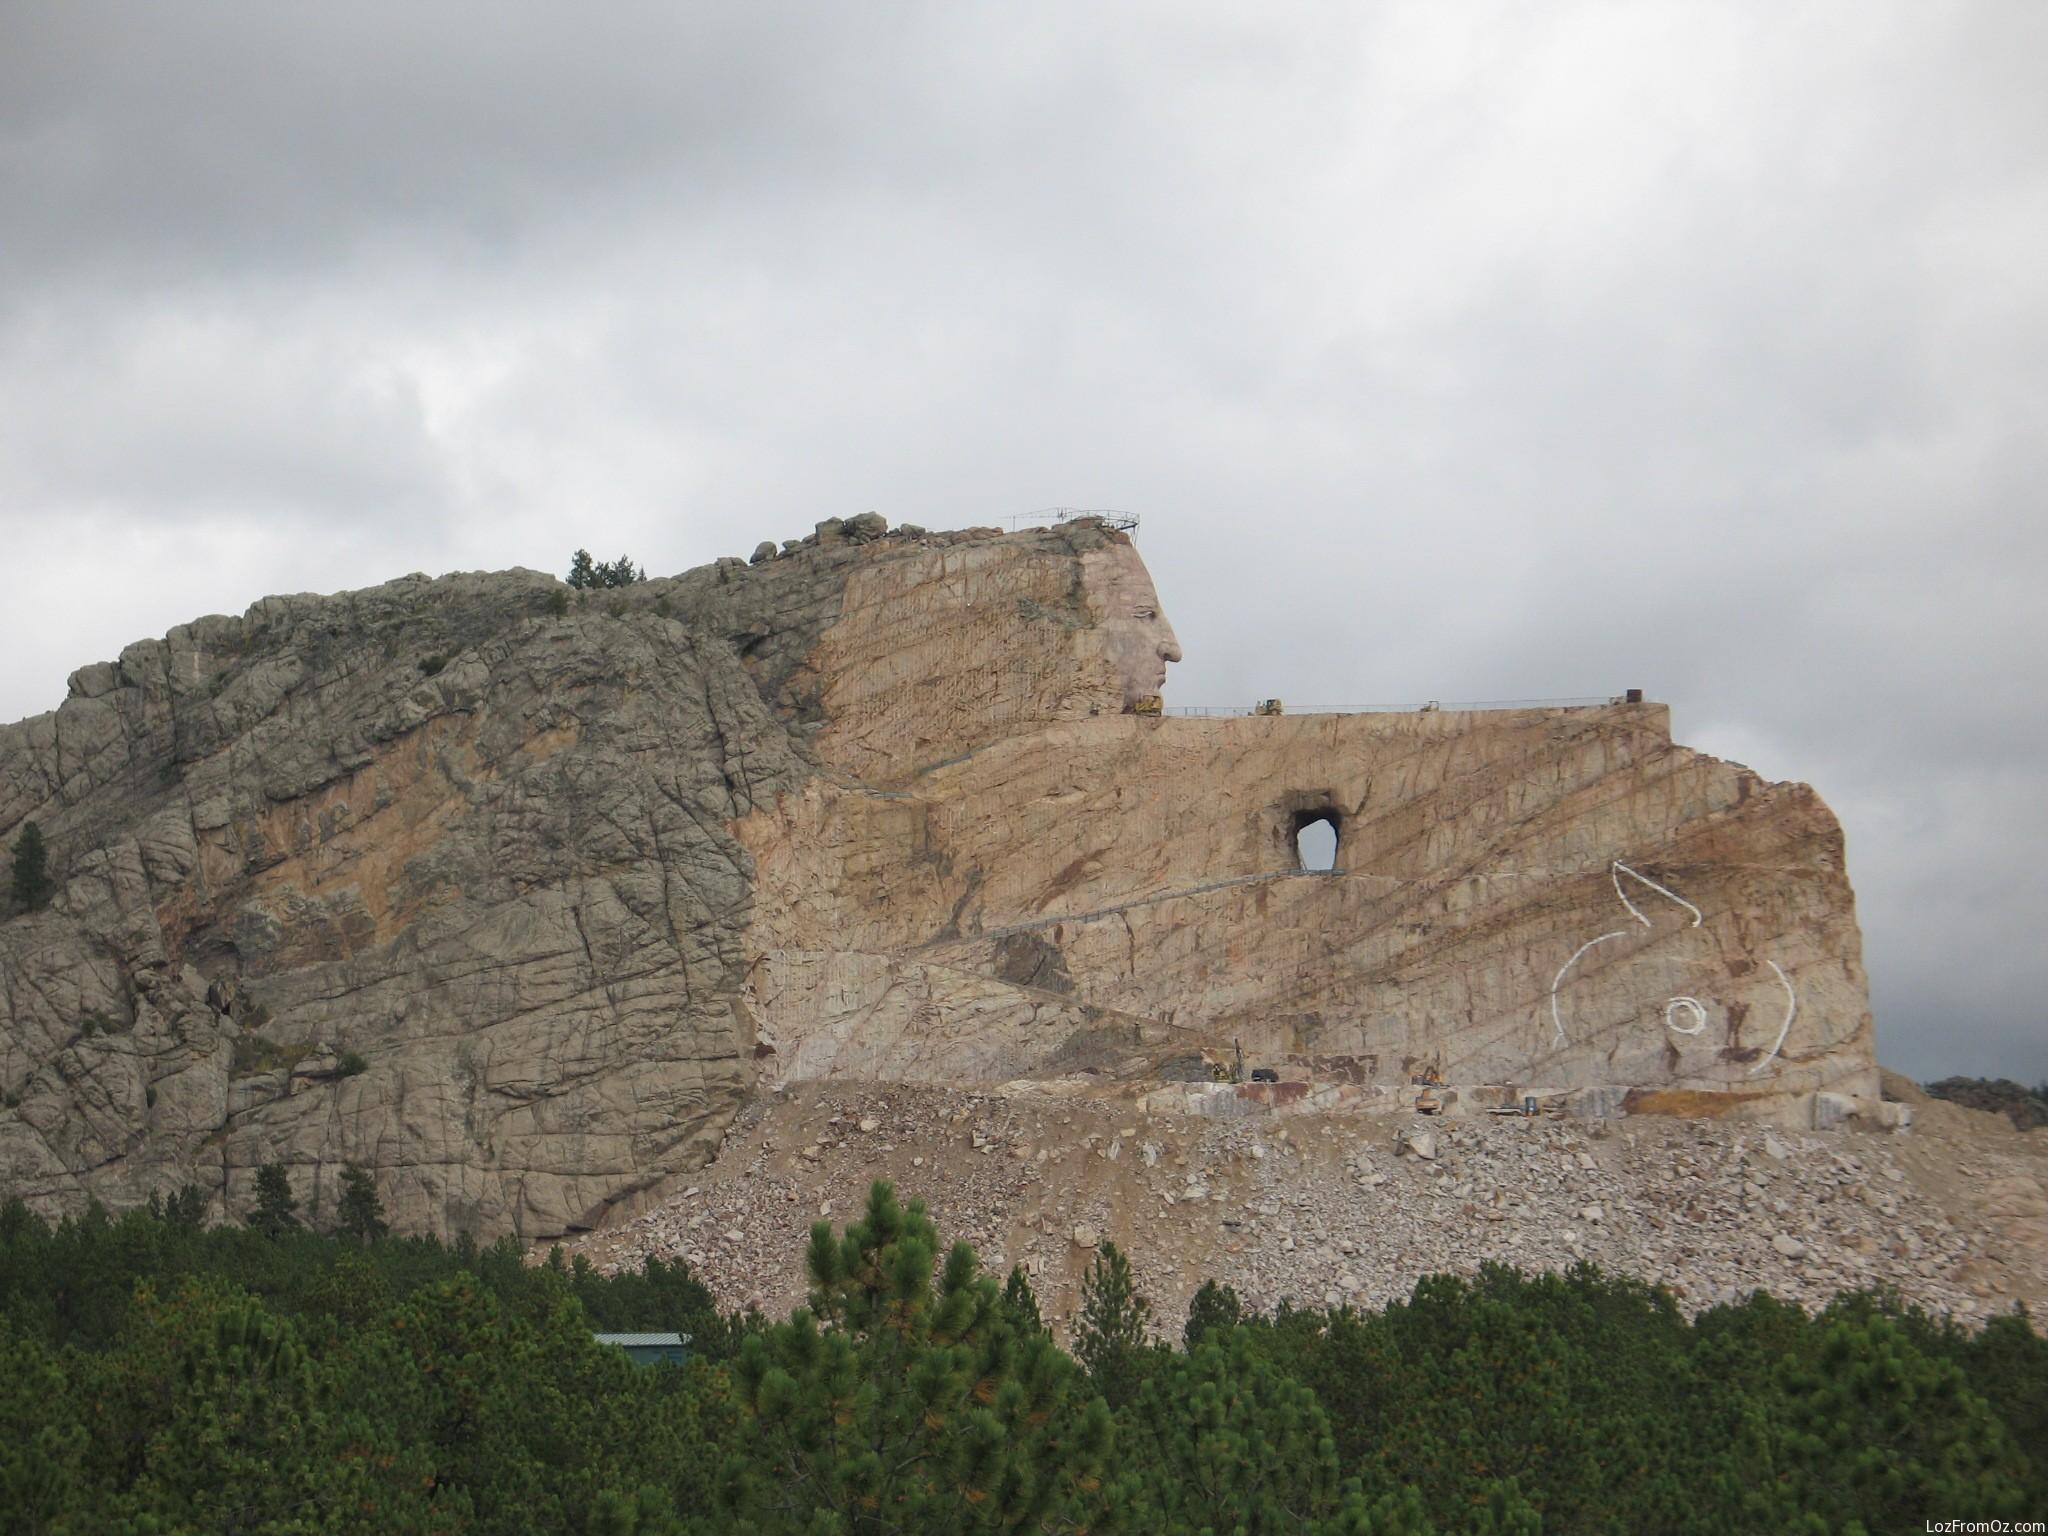 2009 North to Alaska – Day 19